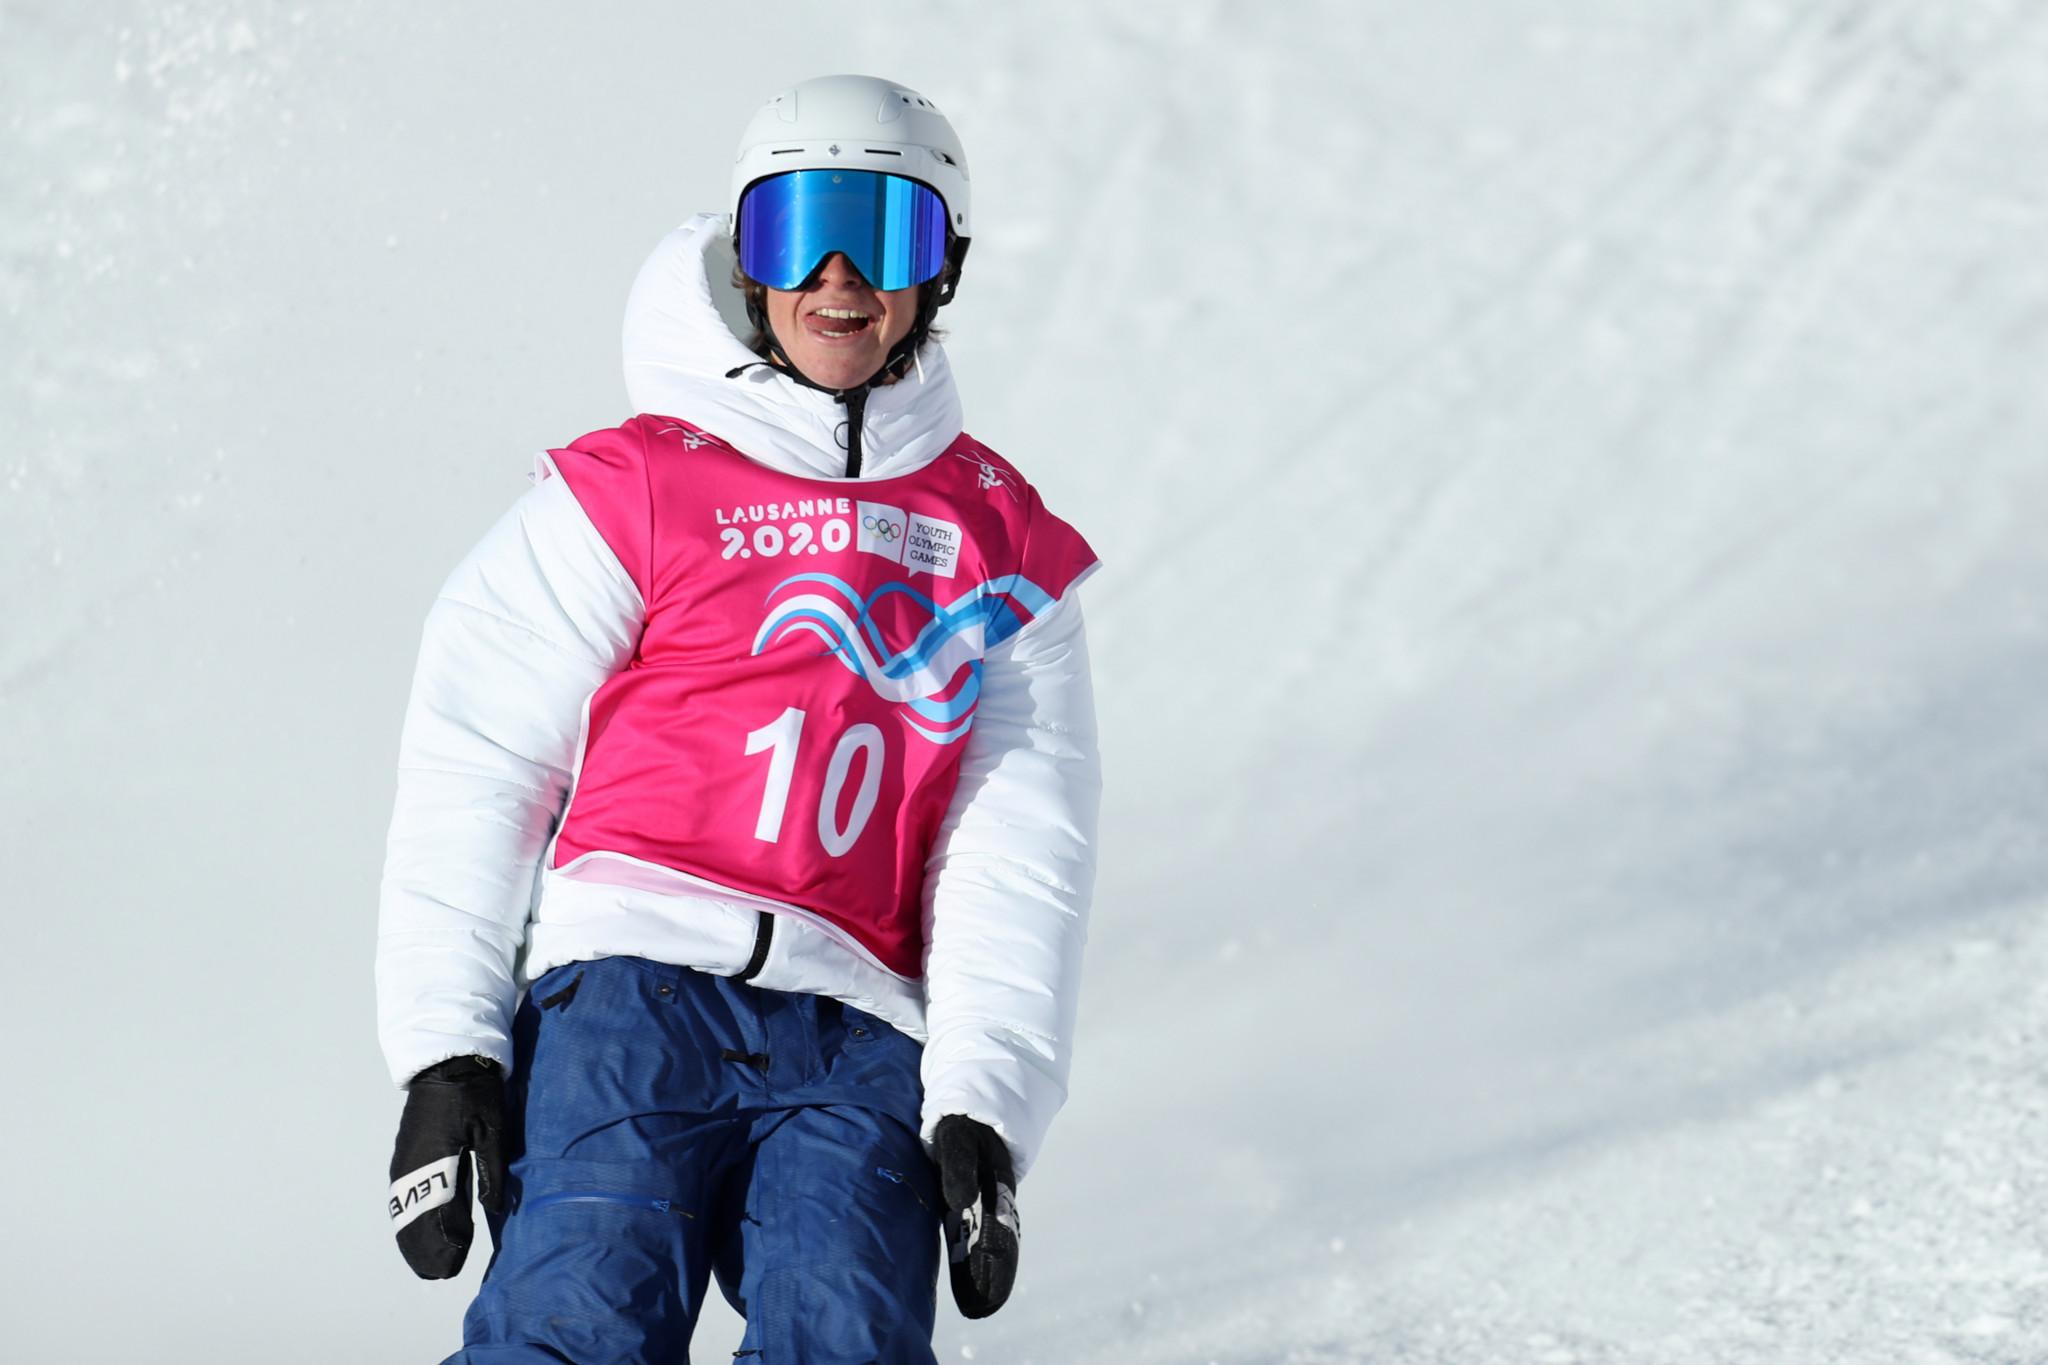 Matej Svancer topped men's qualifying in the freeski slopestyle ©Getty Images